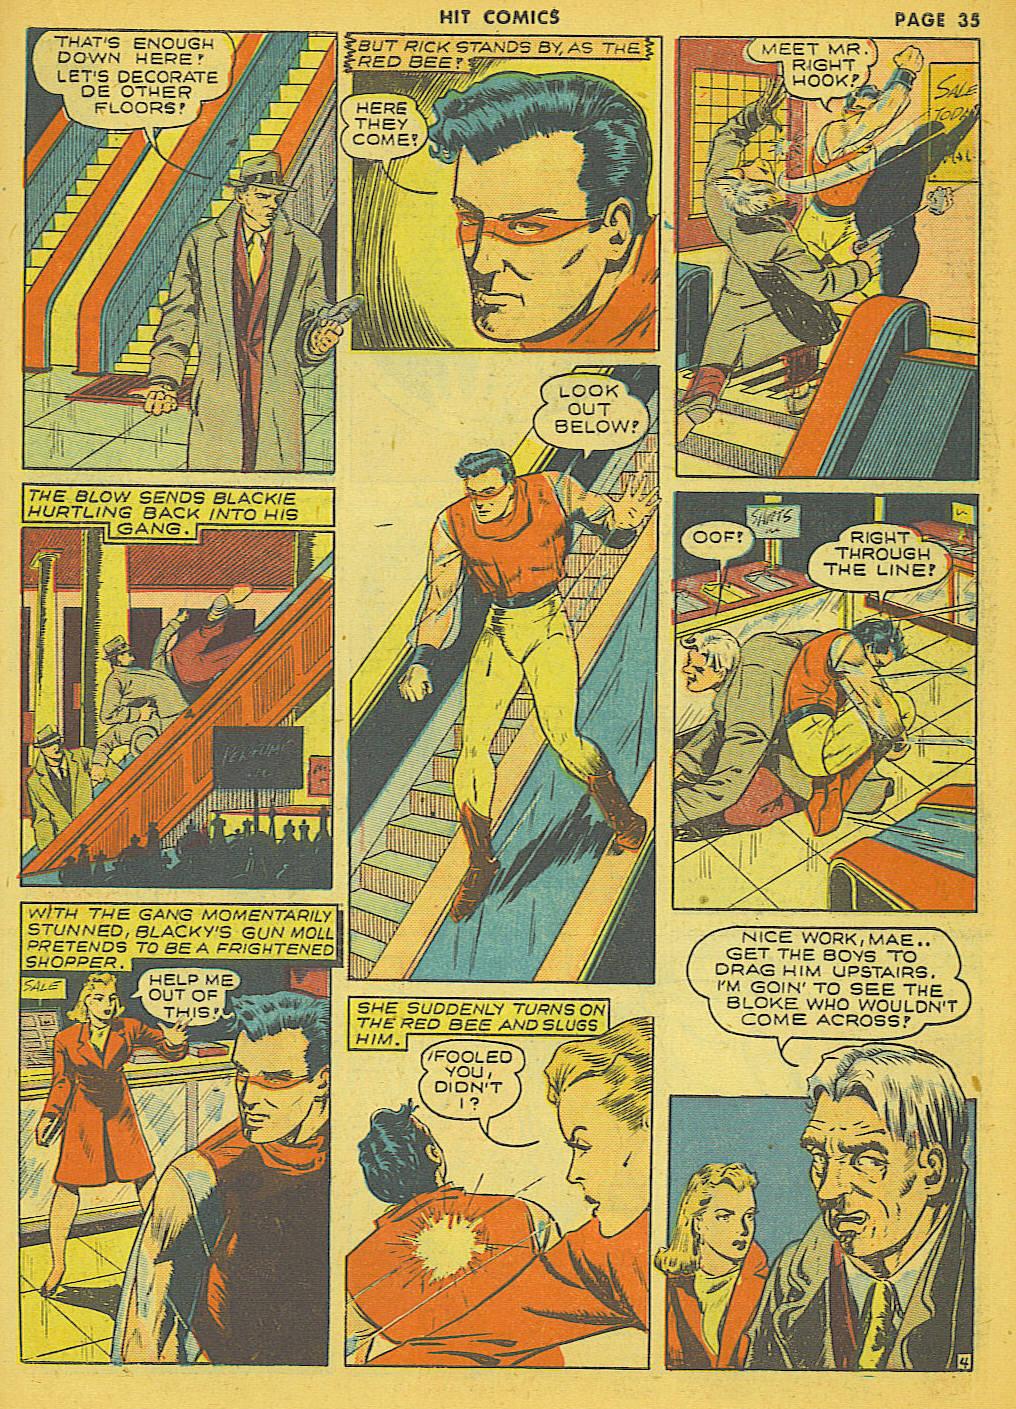 Read online Hit Comics comic -  Issue #21 - 37